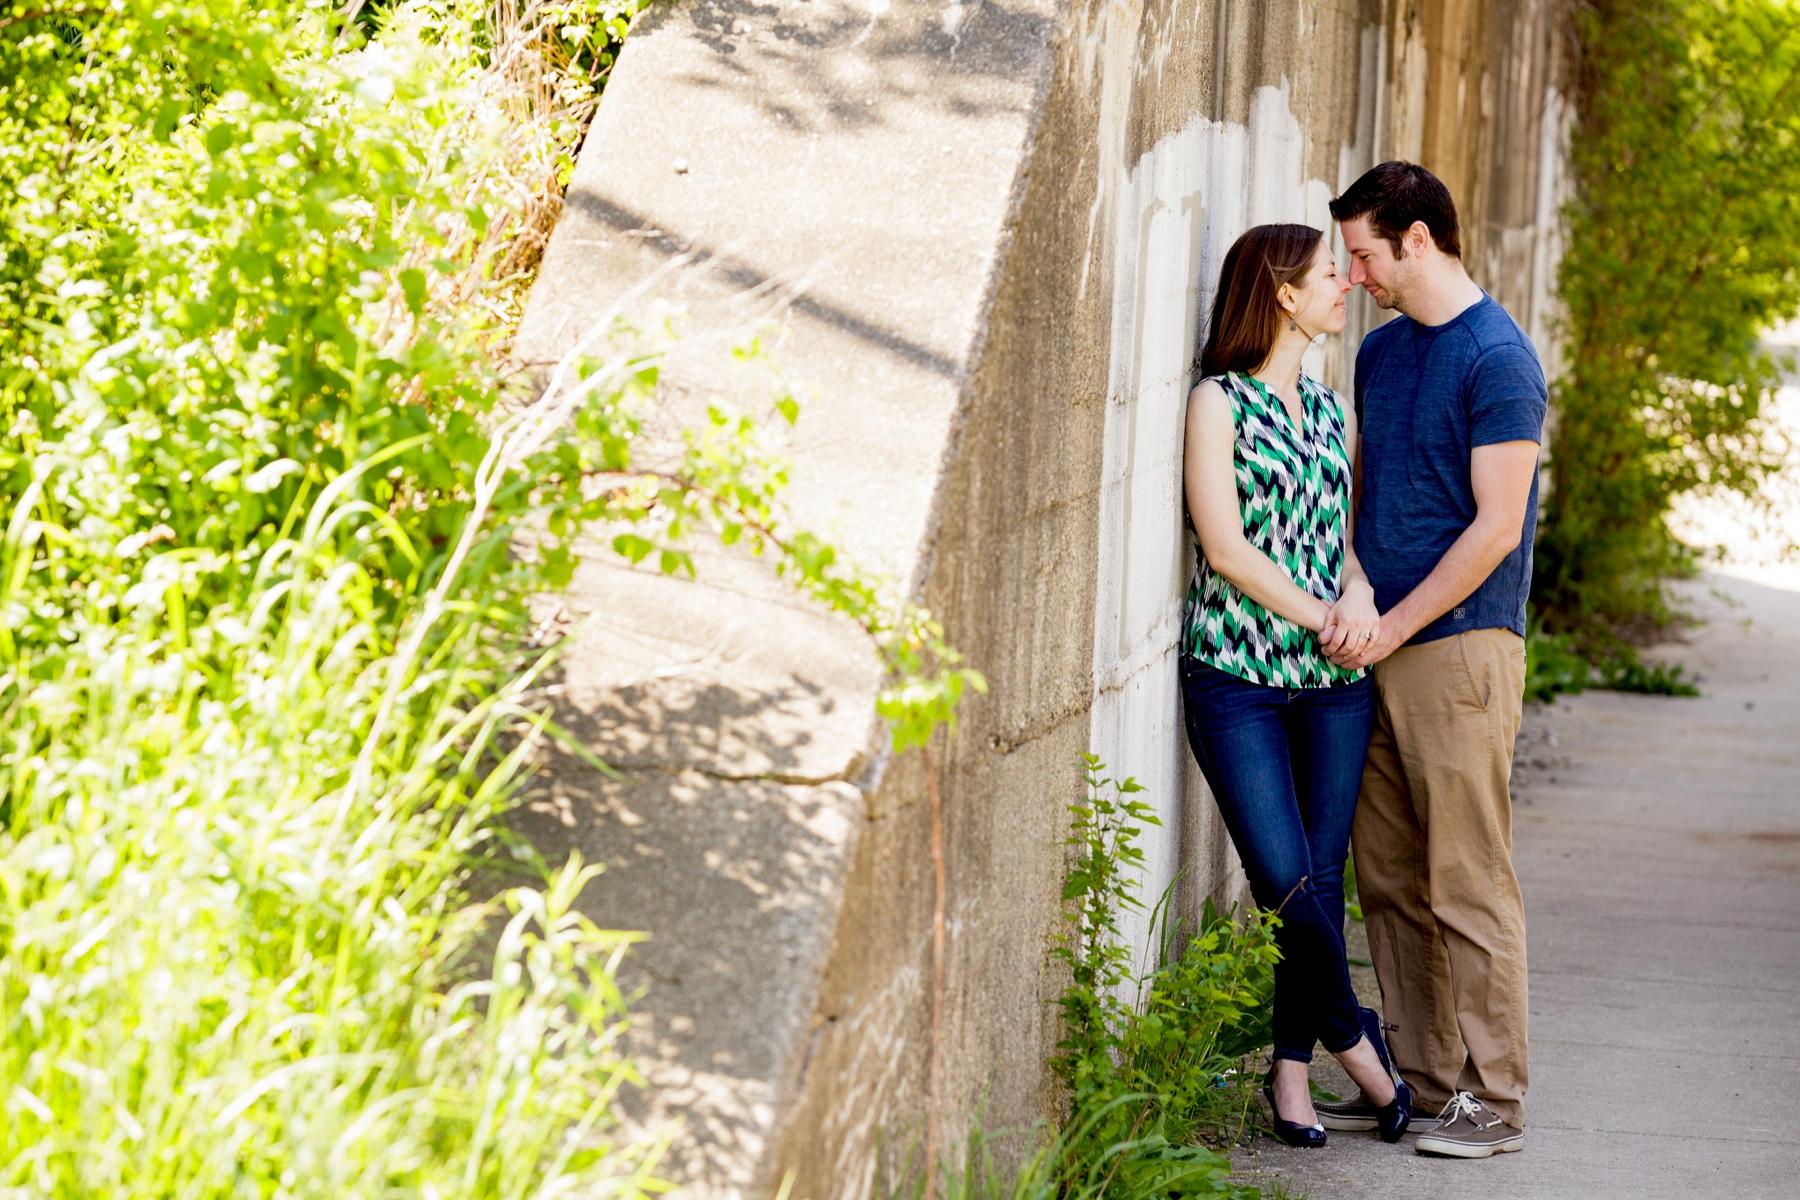 Brandon_Shafer_Photography_Michele_Chris_Michigan_Grand_Rapids_City_Engagement_0027.jpg